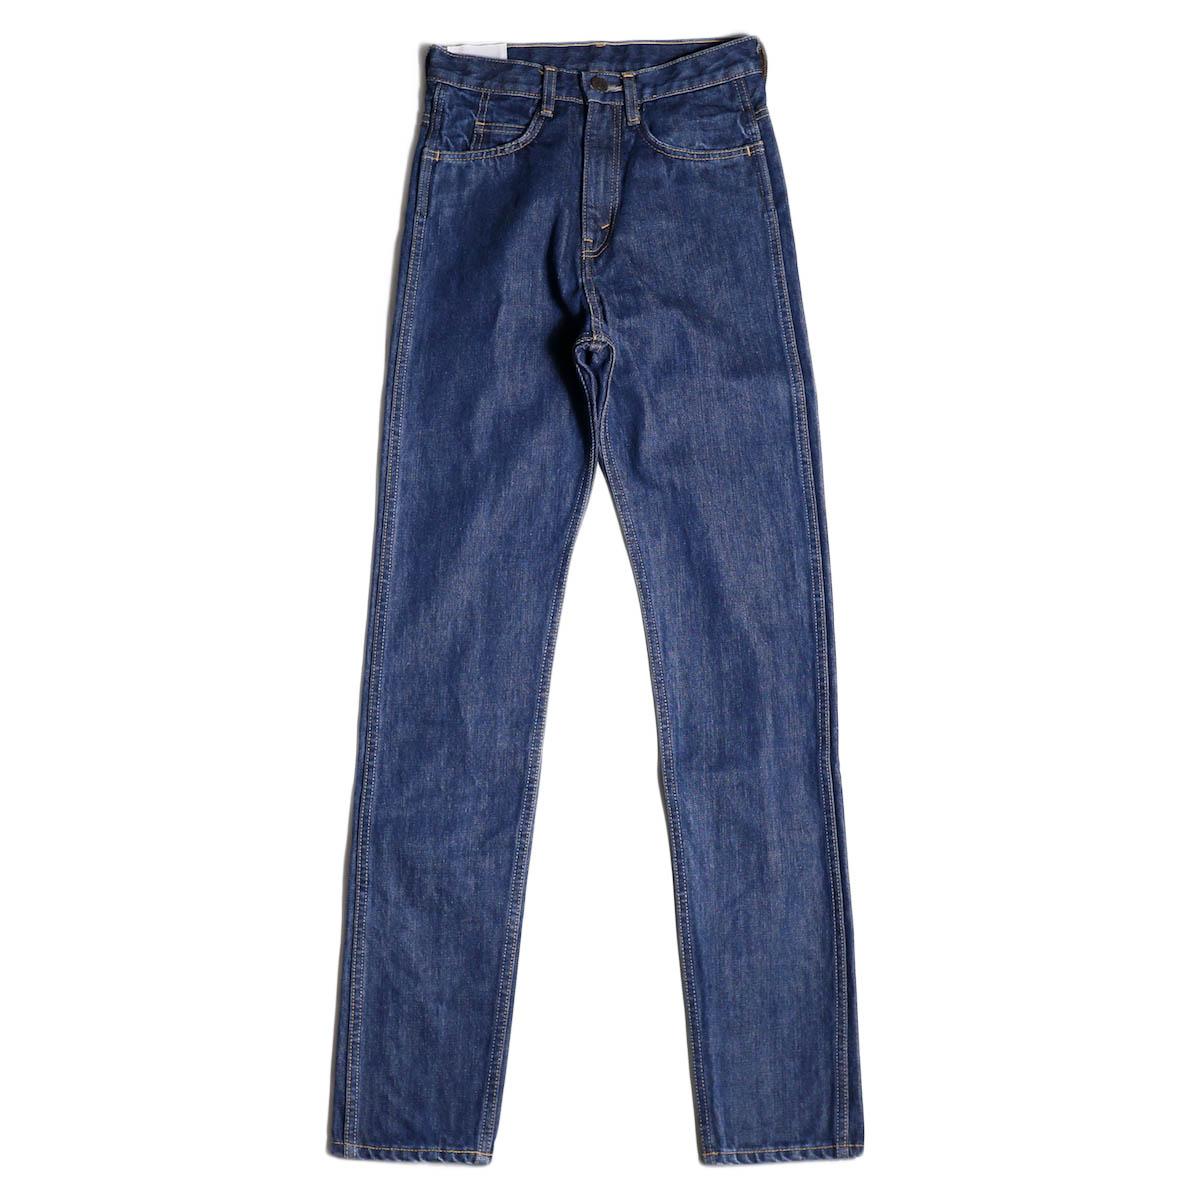 FUMIKA UCHIDA / High Waist Denim Pant Slim